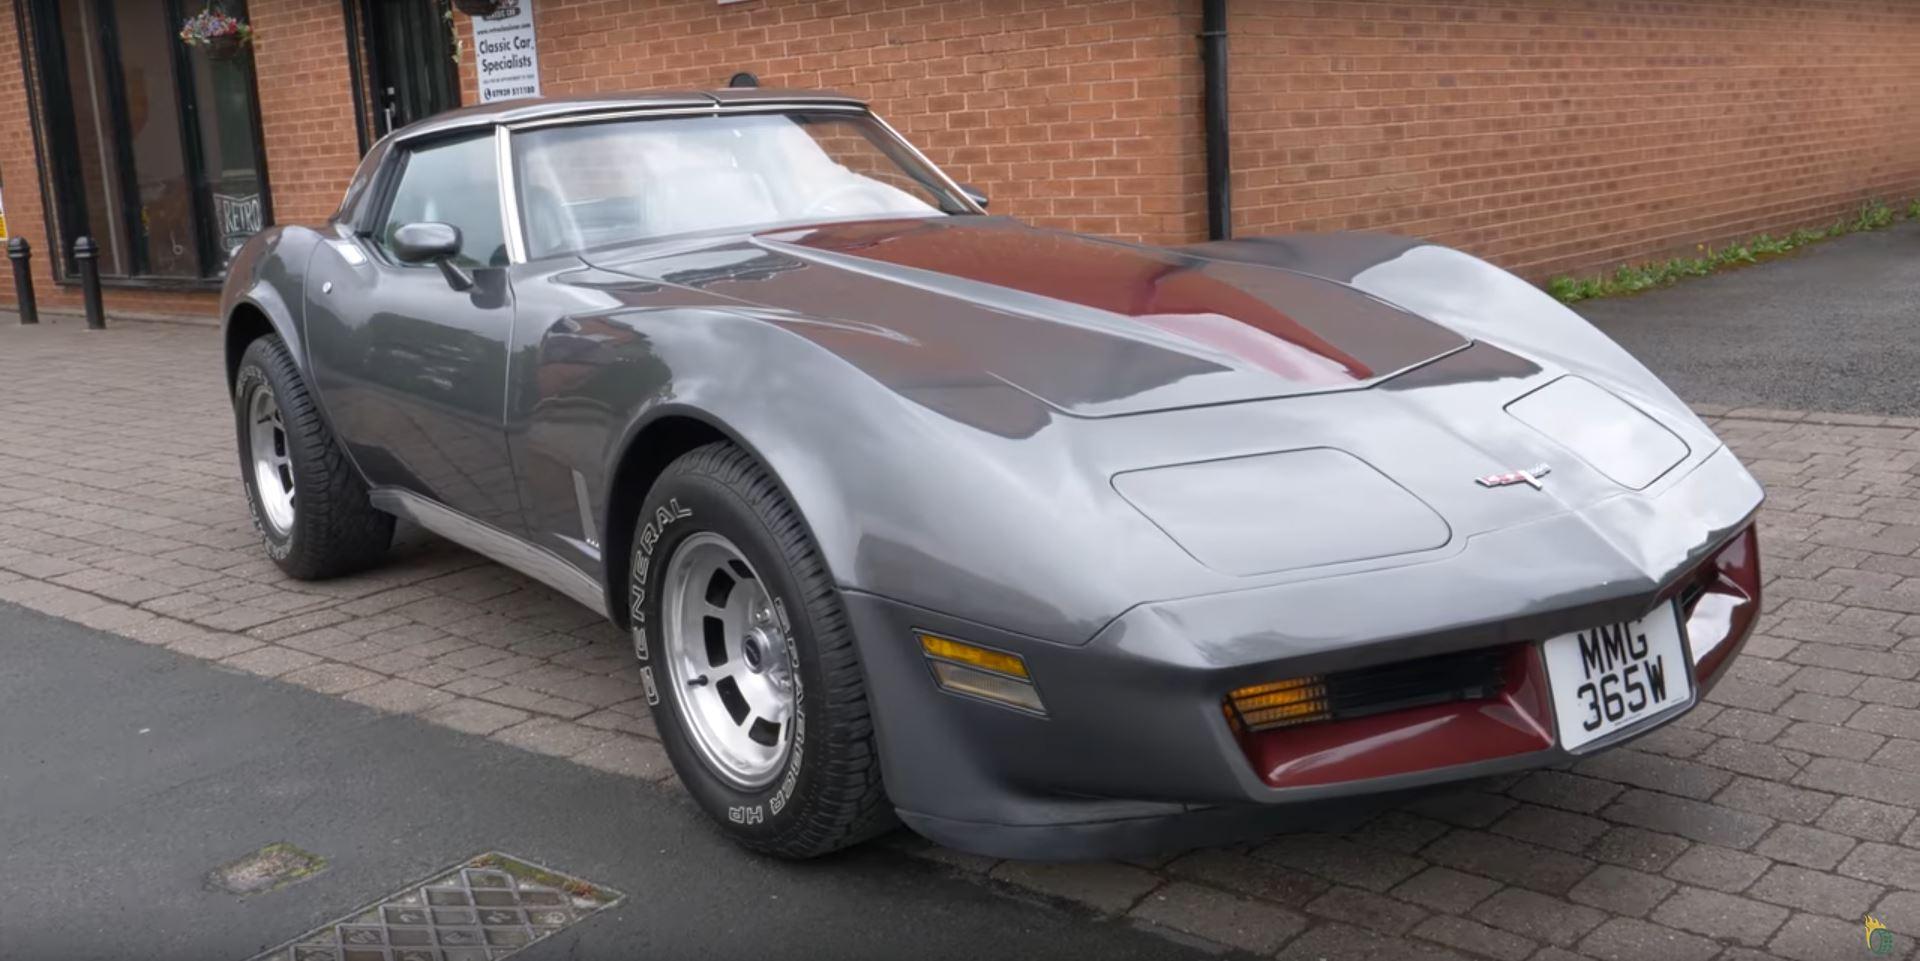 1981 Corvette C3 in the UK